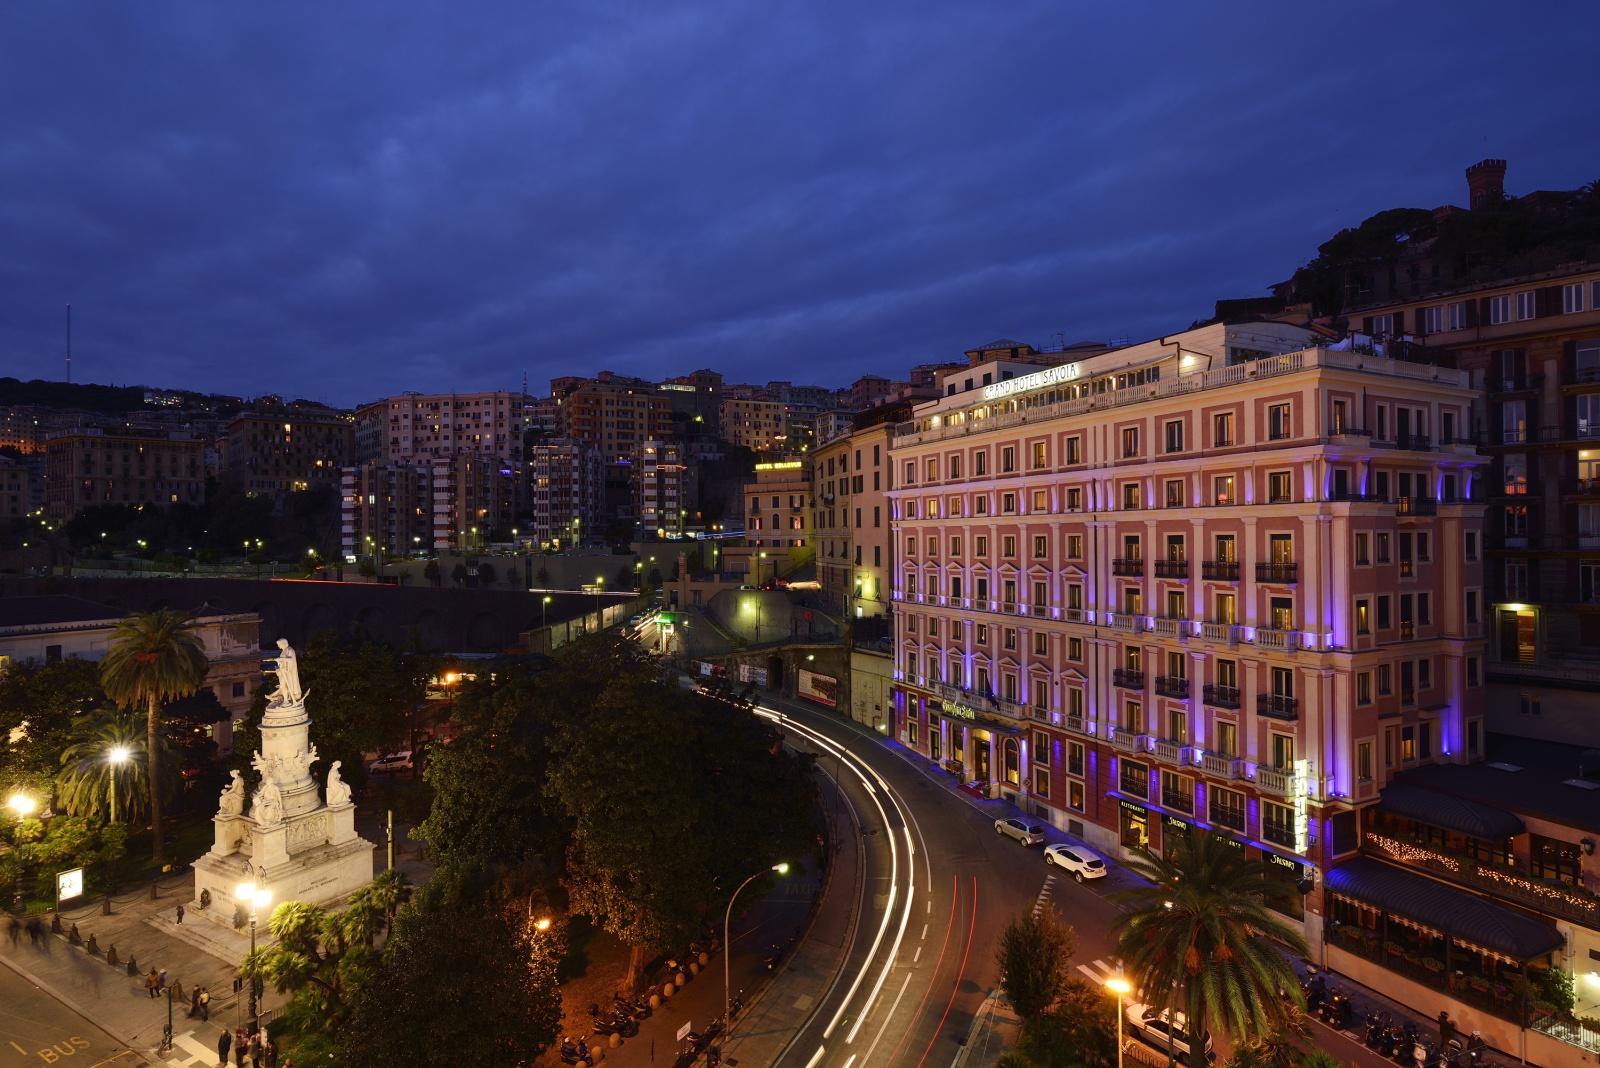 Grand Hotel Savoia Secret Beach In Genoa